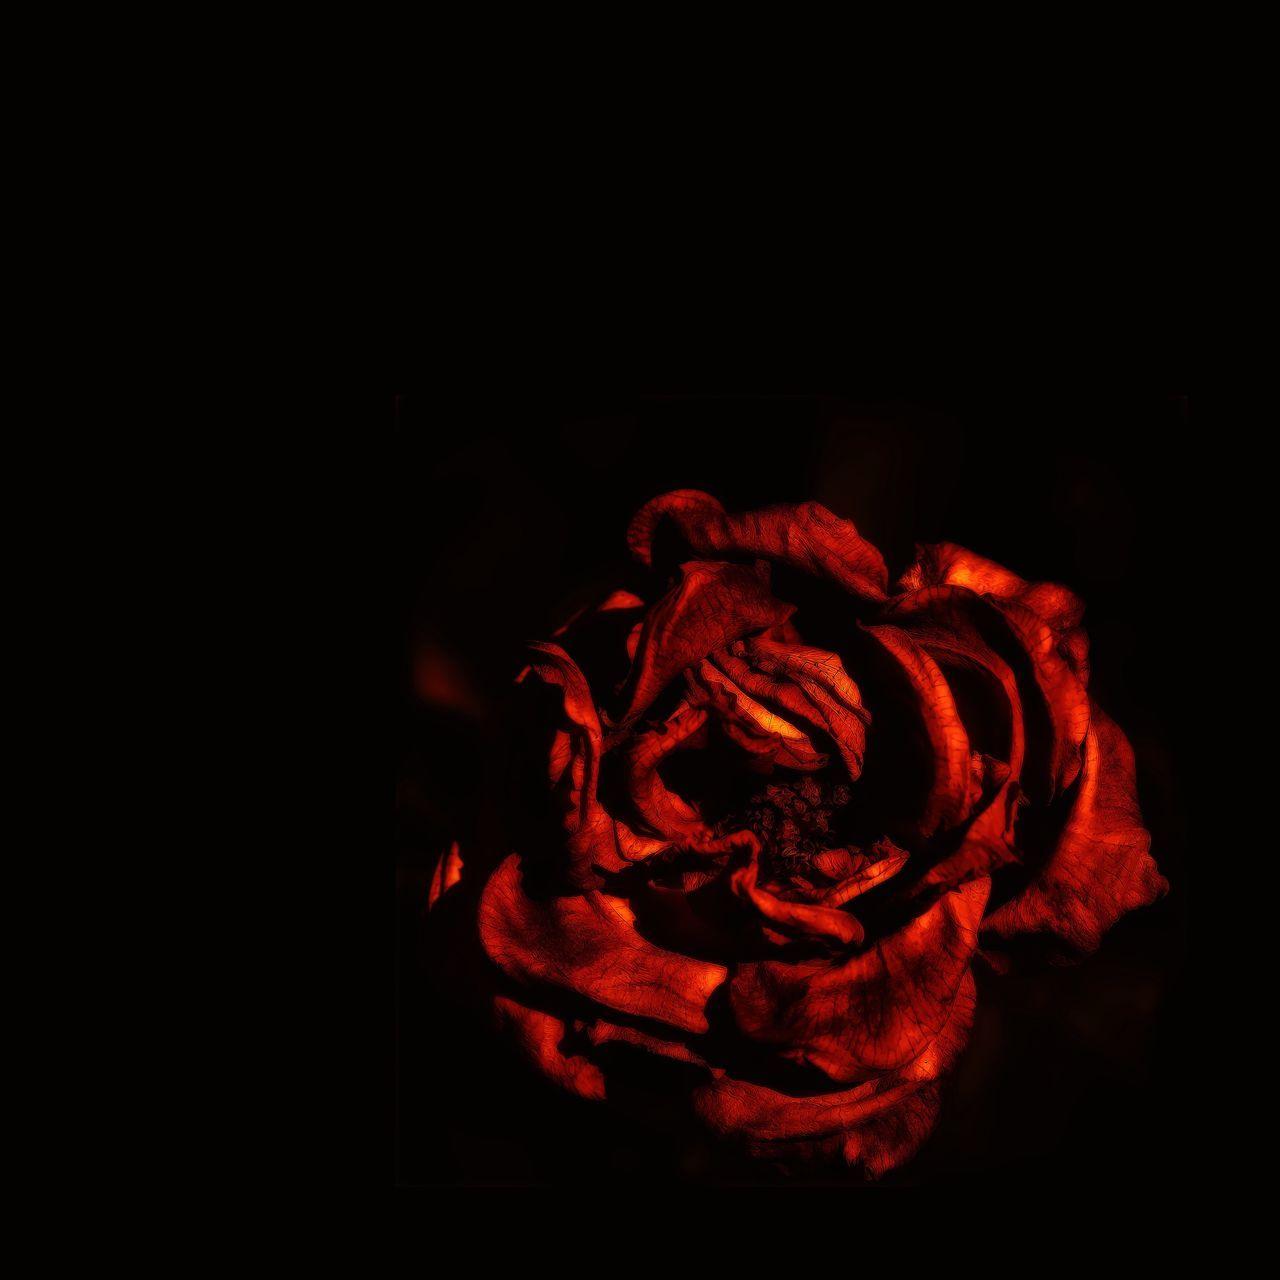 Withered Rose Red Fragility Wabisabi Fineart Flower Petal Nature Graphic EyeEm Black Background Close-up Wabi-sabi Fine Art EyeEm Best Shots - Nature EyeEm Nature Lover Fine Art Photography Beauty In Nature Flower Head